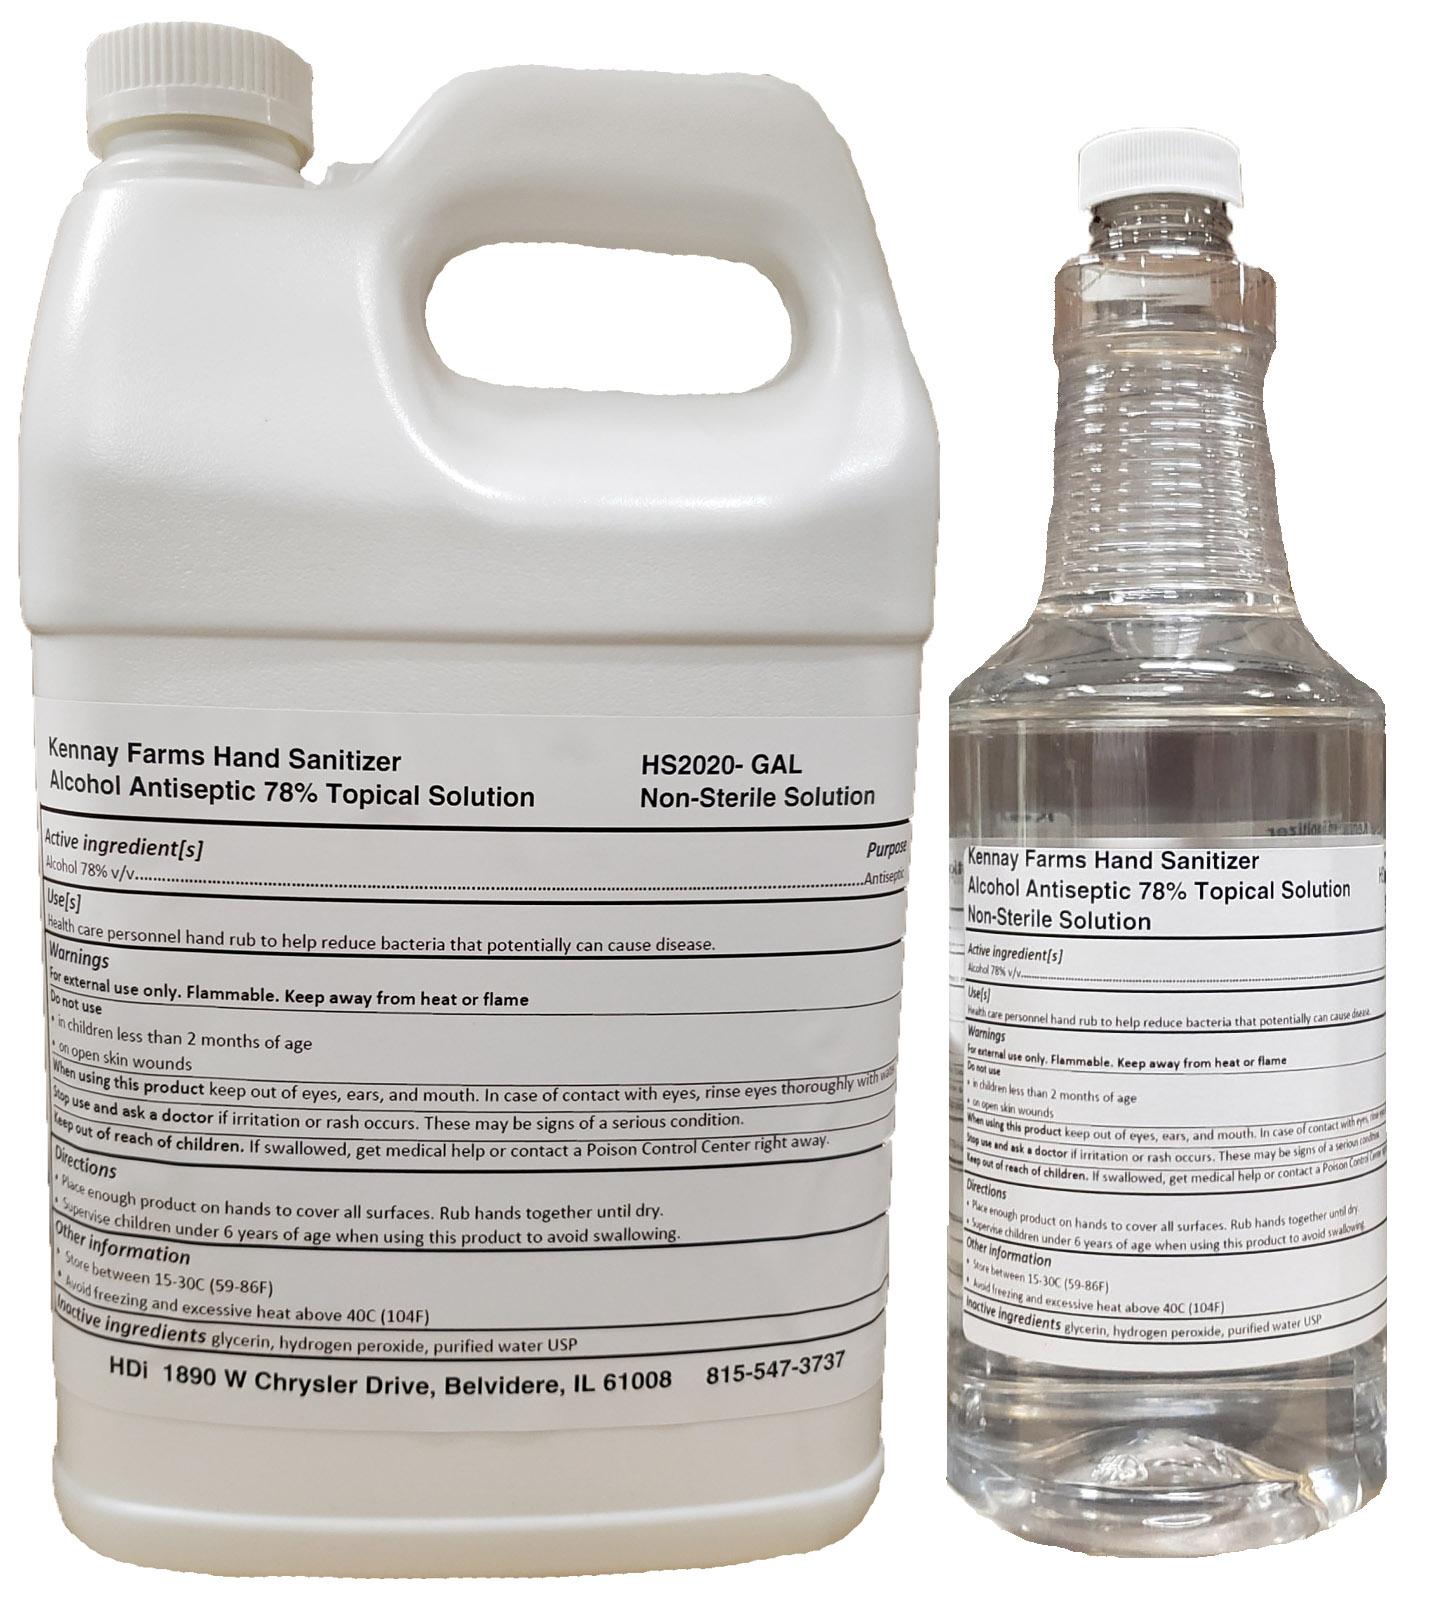 HDi Antiseptic hand sanitizer